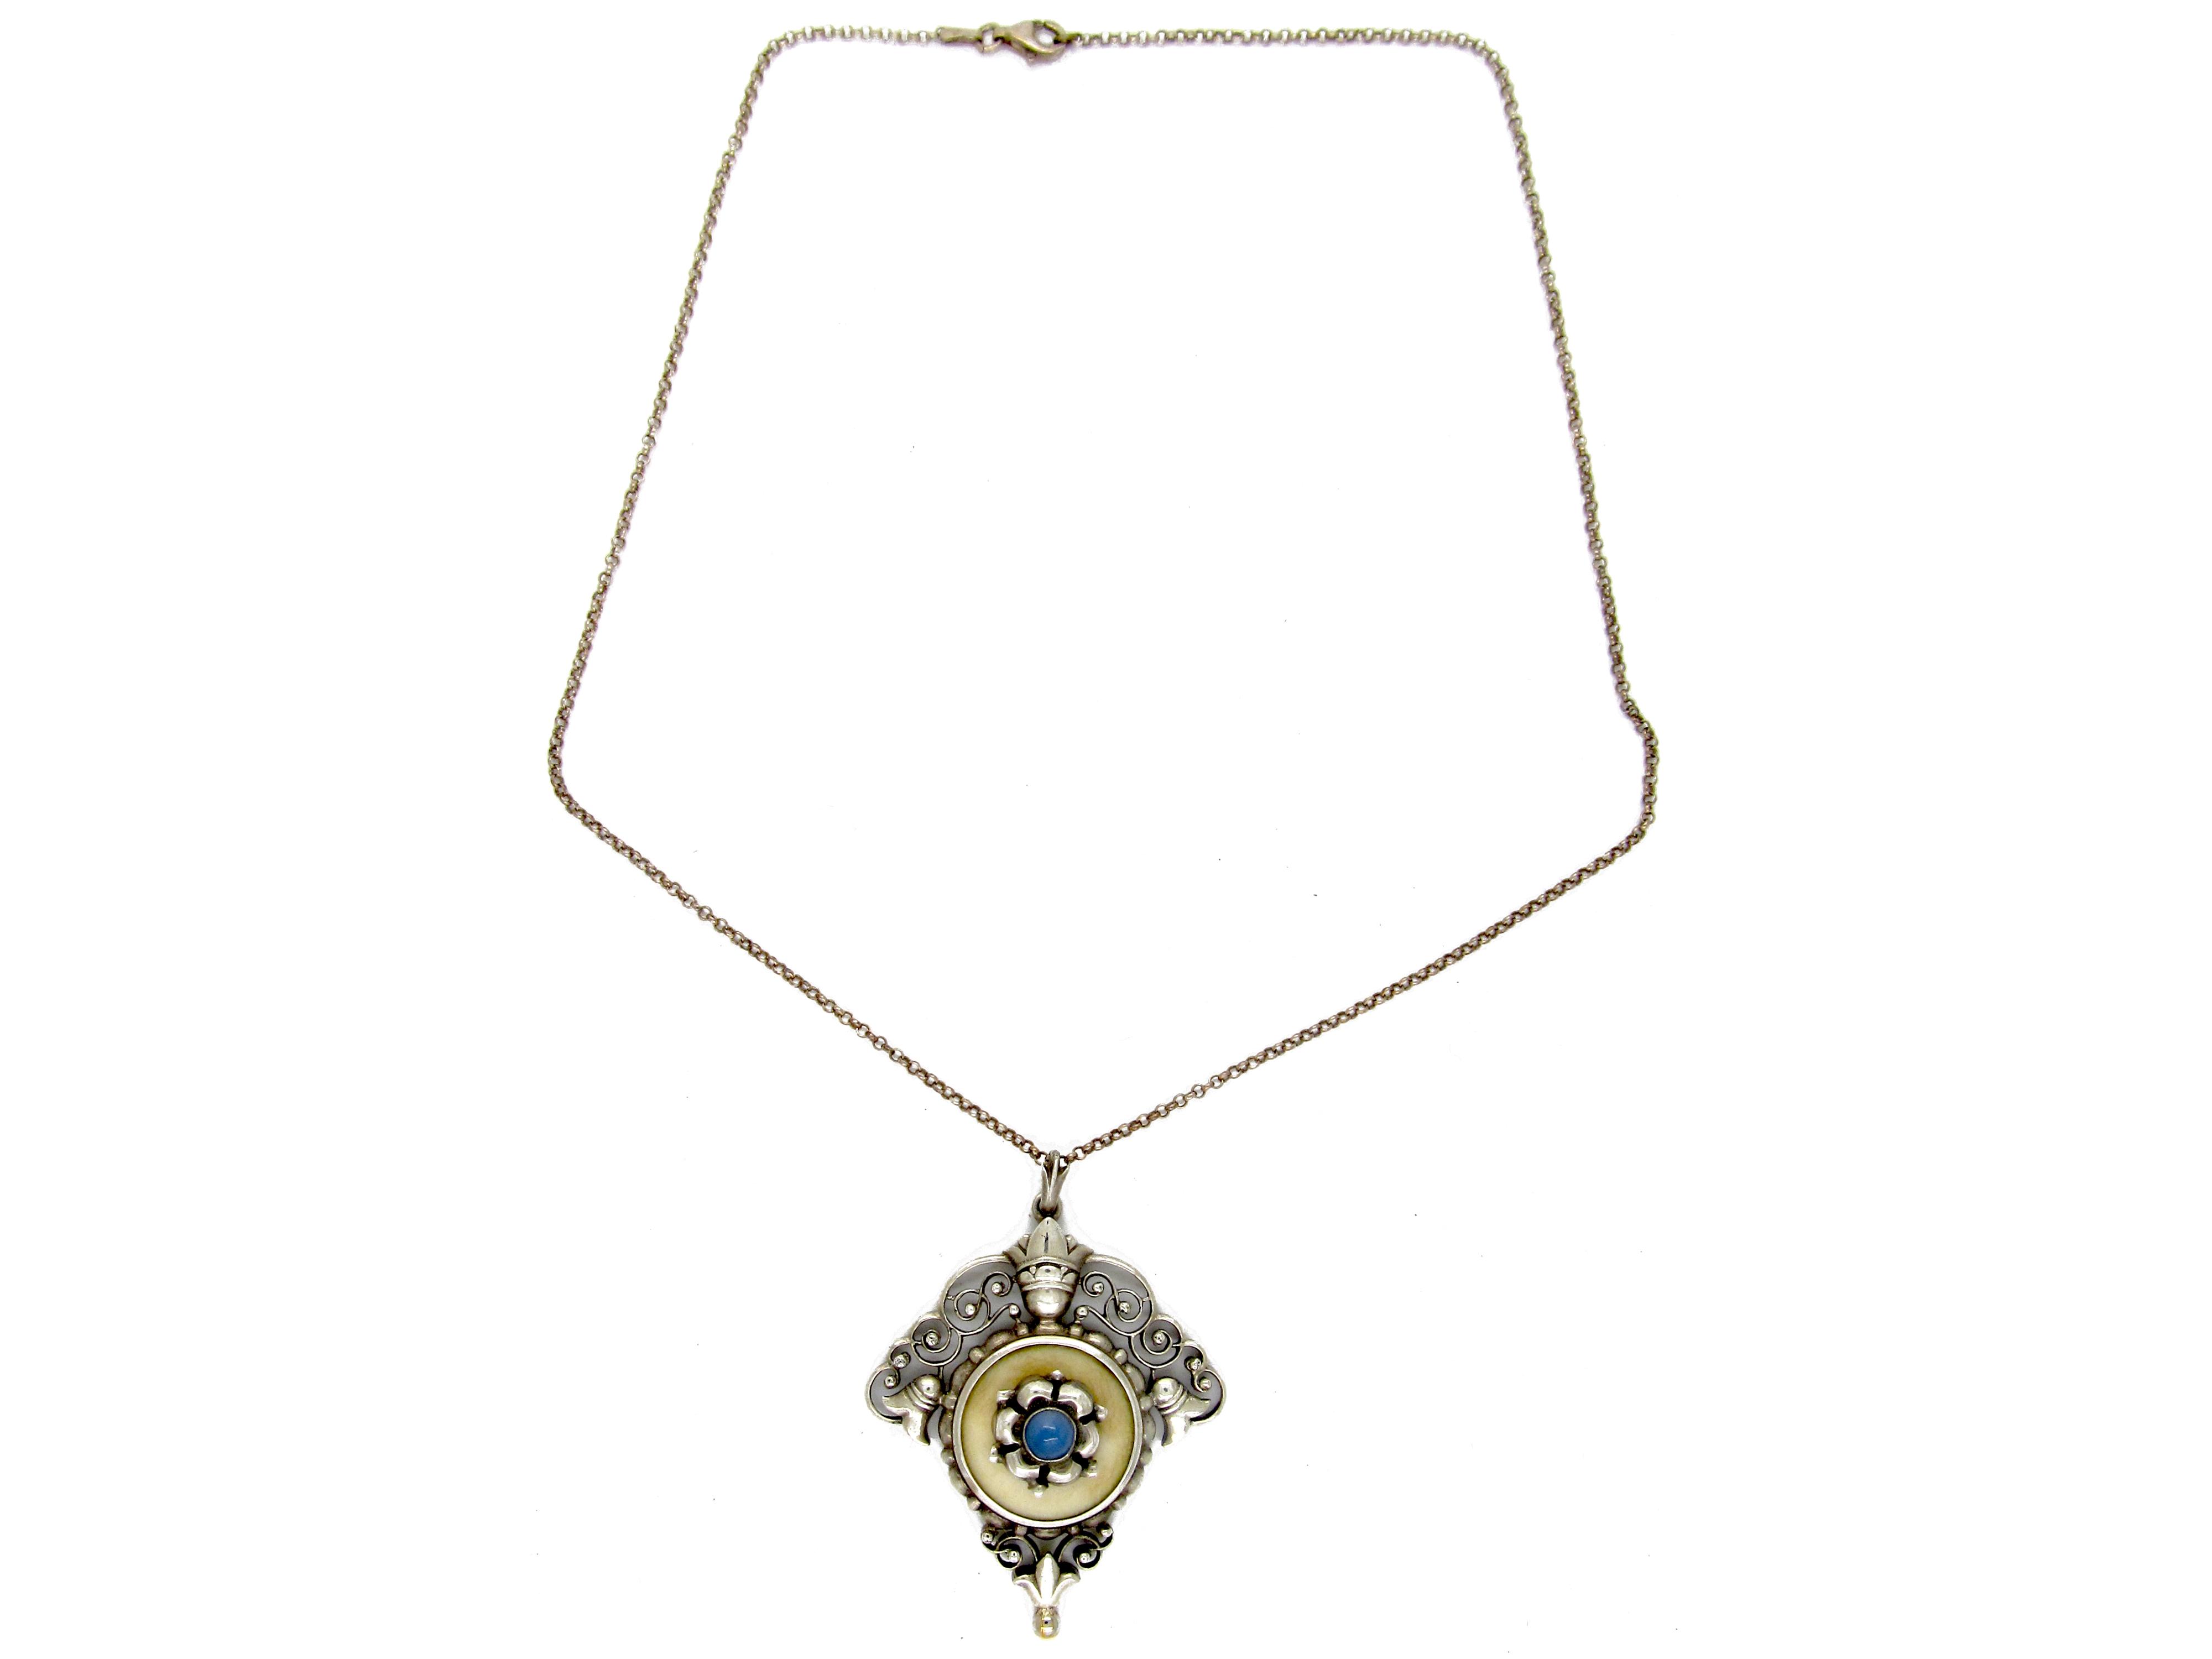 Art Nouveau Silver Pendant on Chain by Meyer